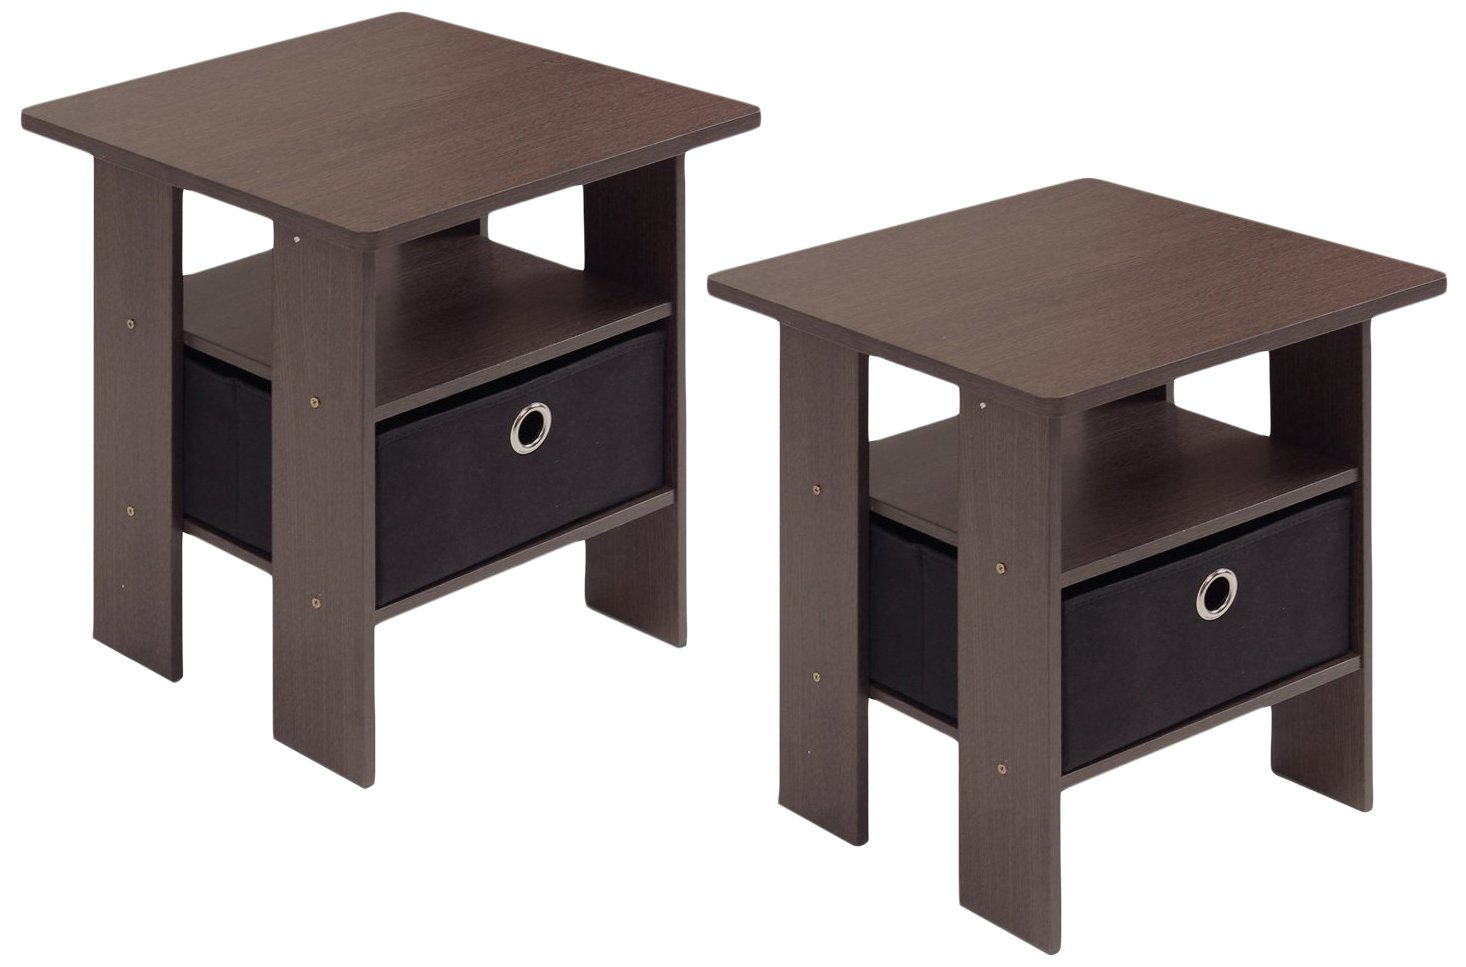 Furinno 2-11157DBR End Table Bedroom Night Stand, Petite, Dark Brown, Set of 2 by Furinno